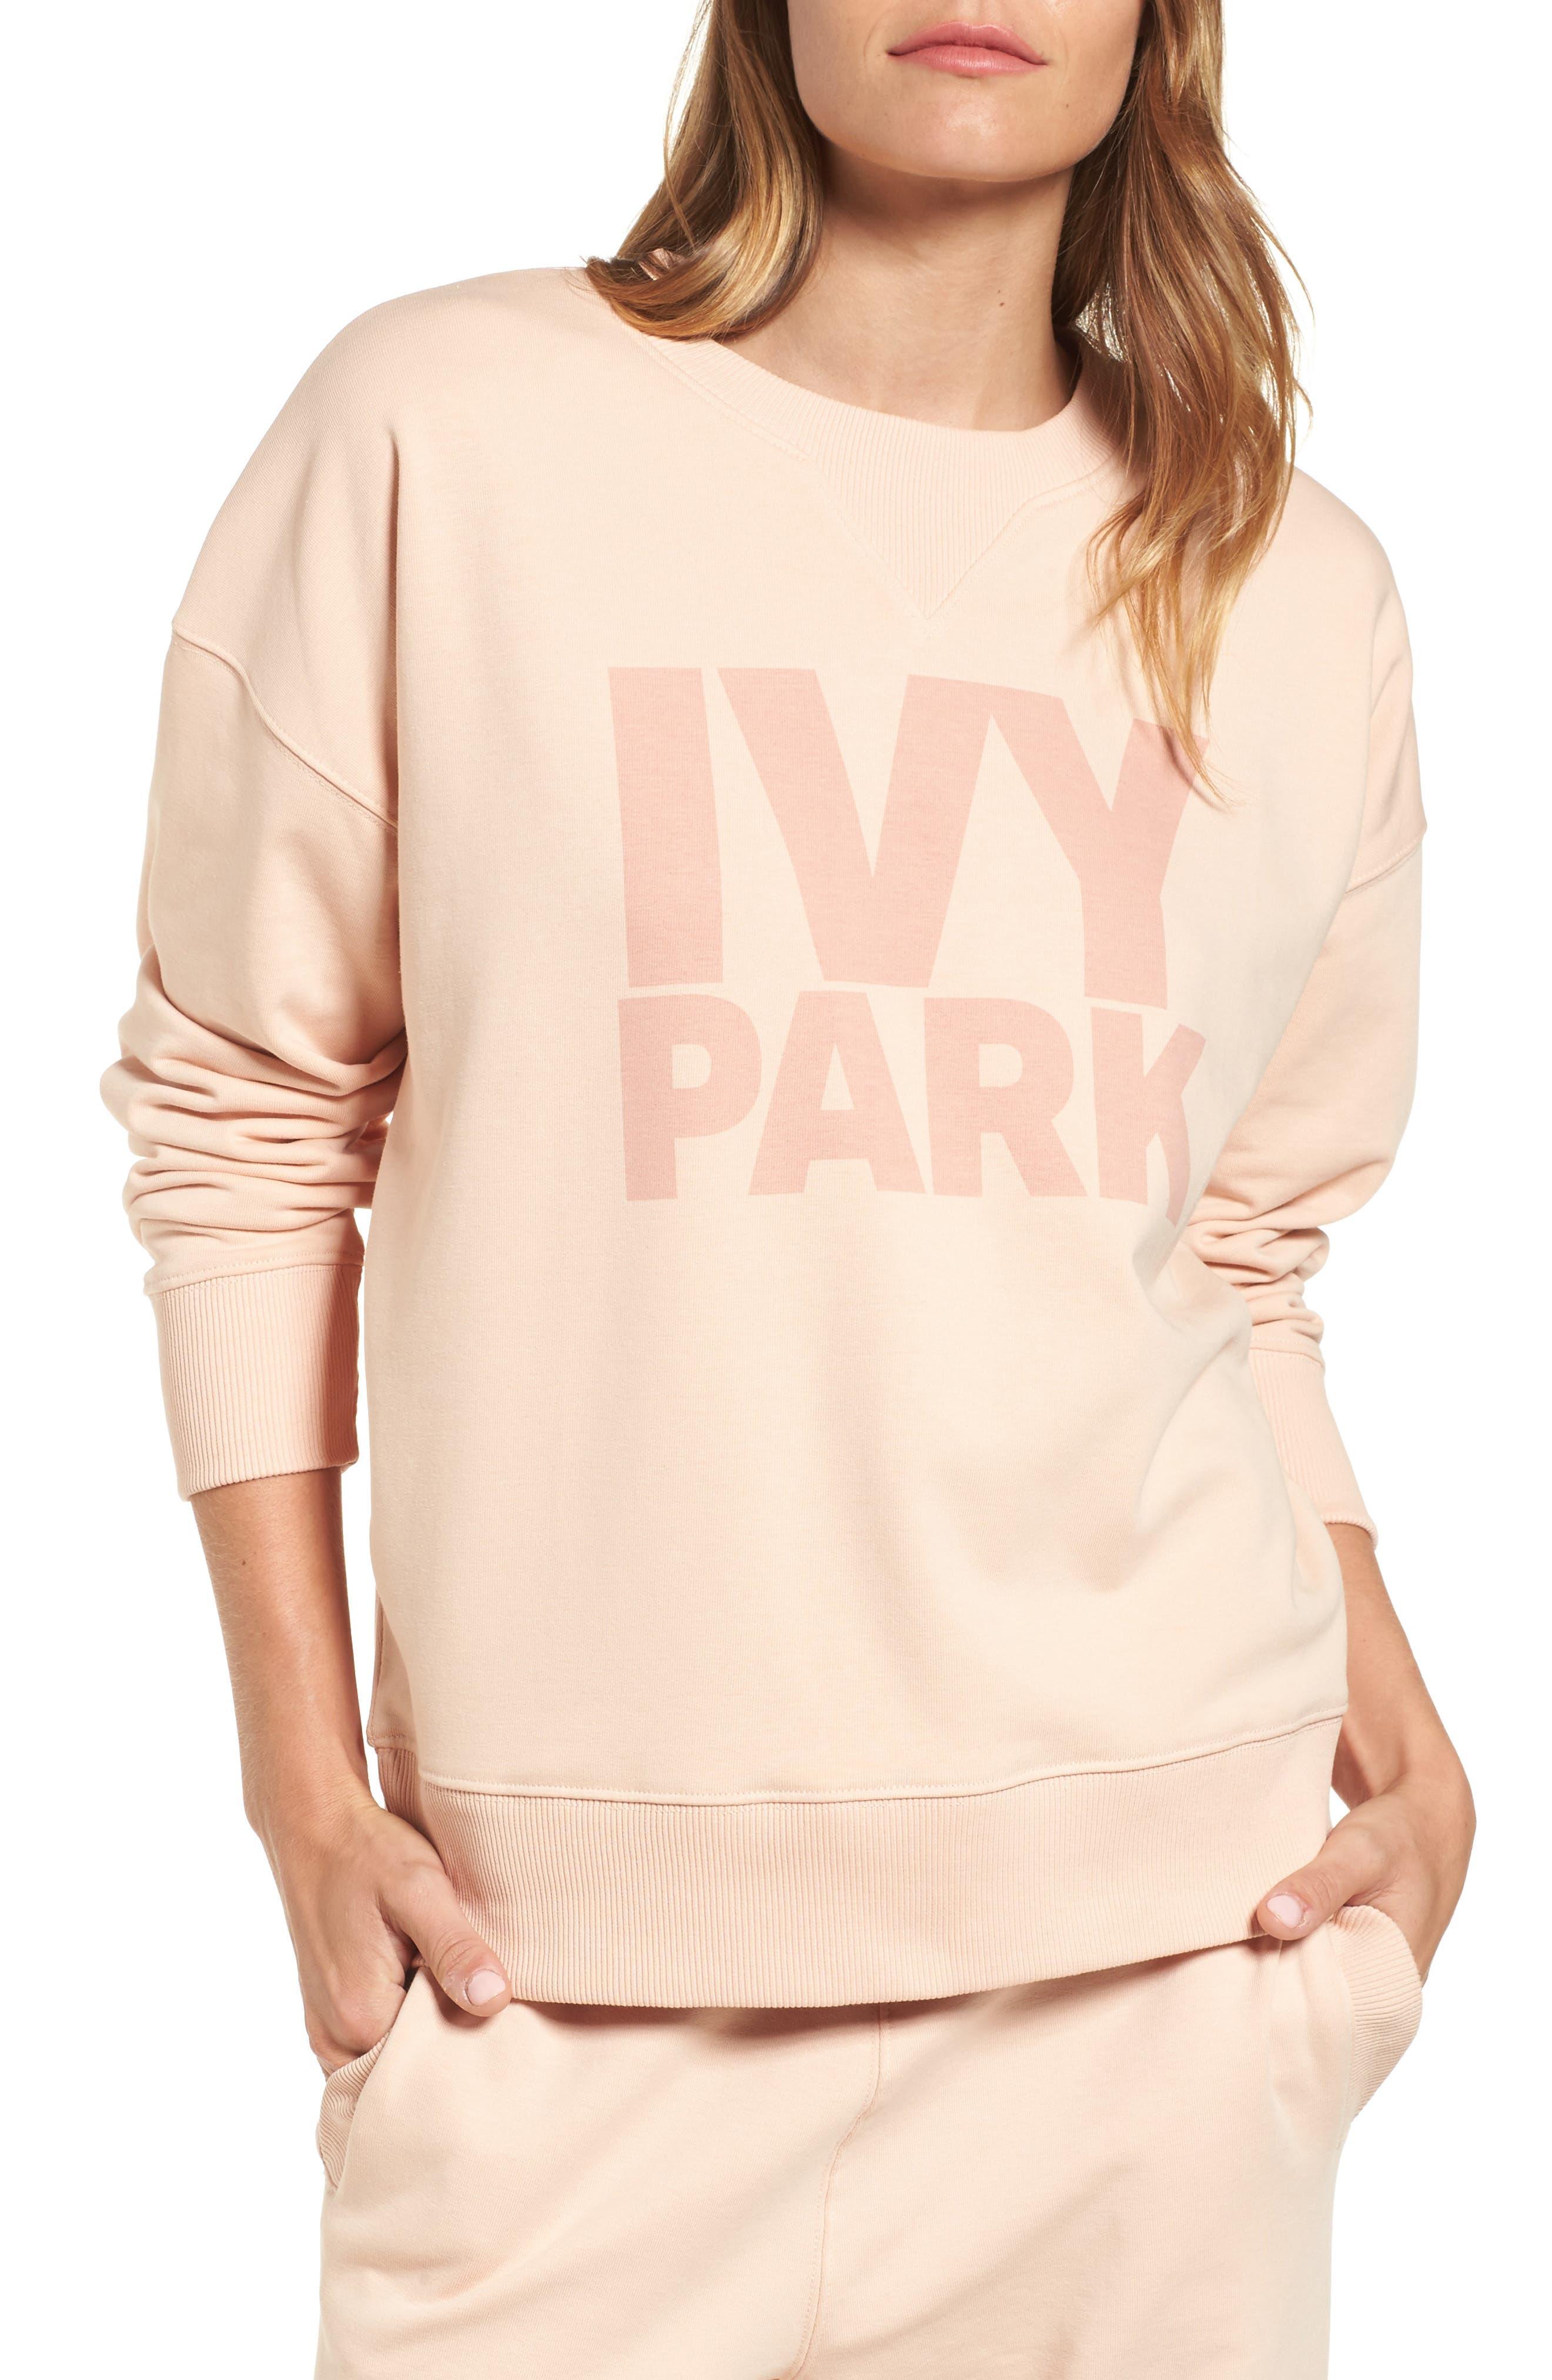 IVY PARK® Logo Sweatshirt